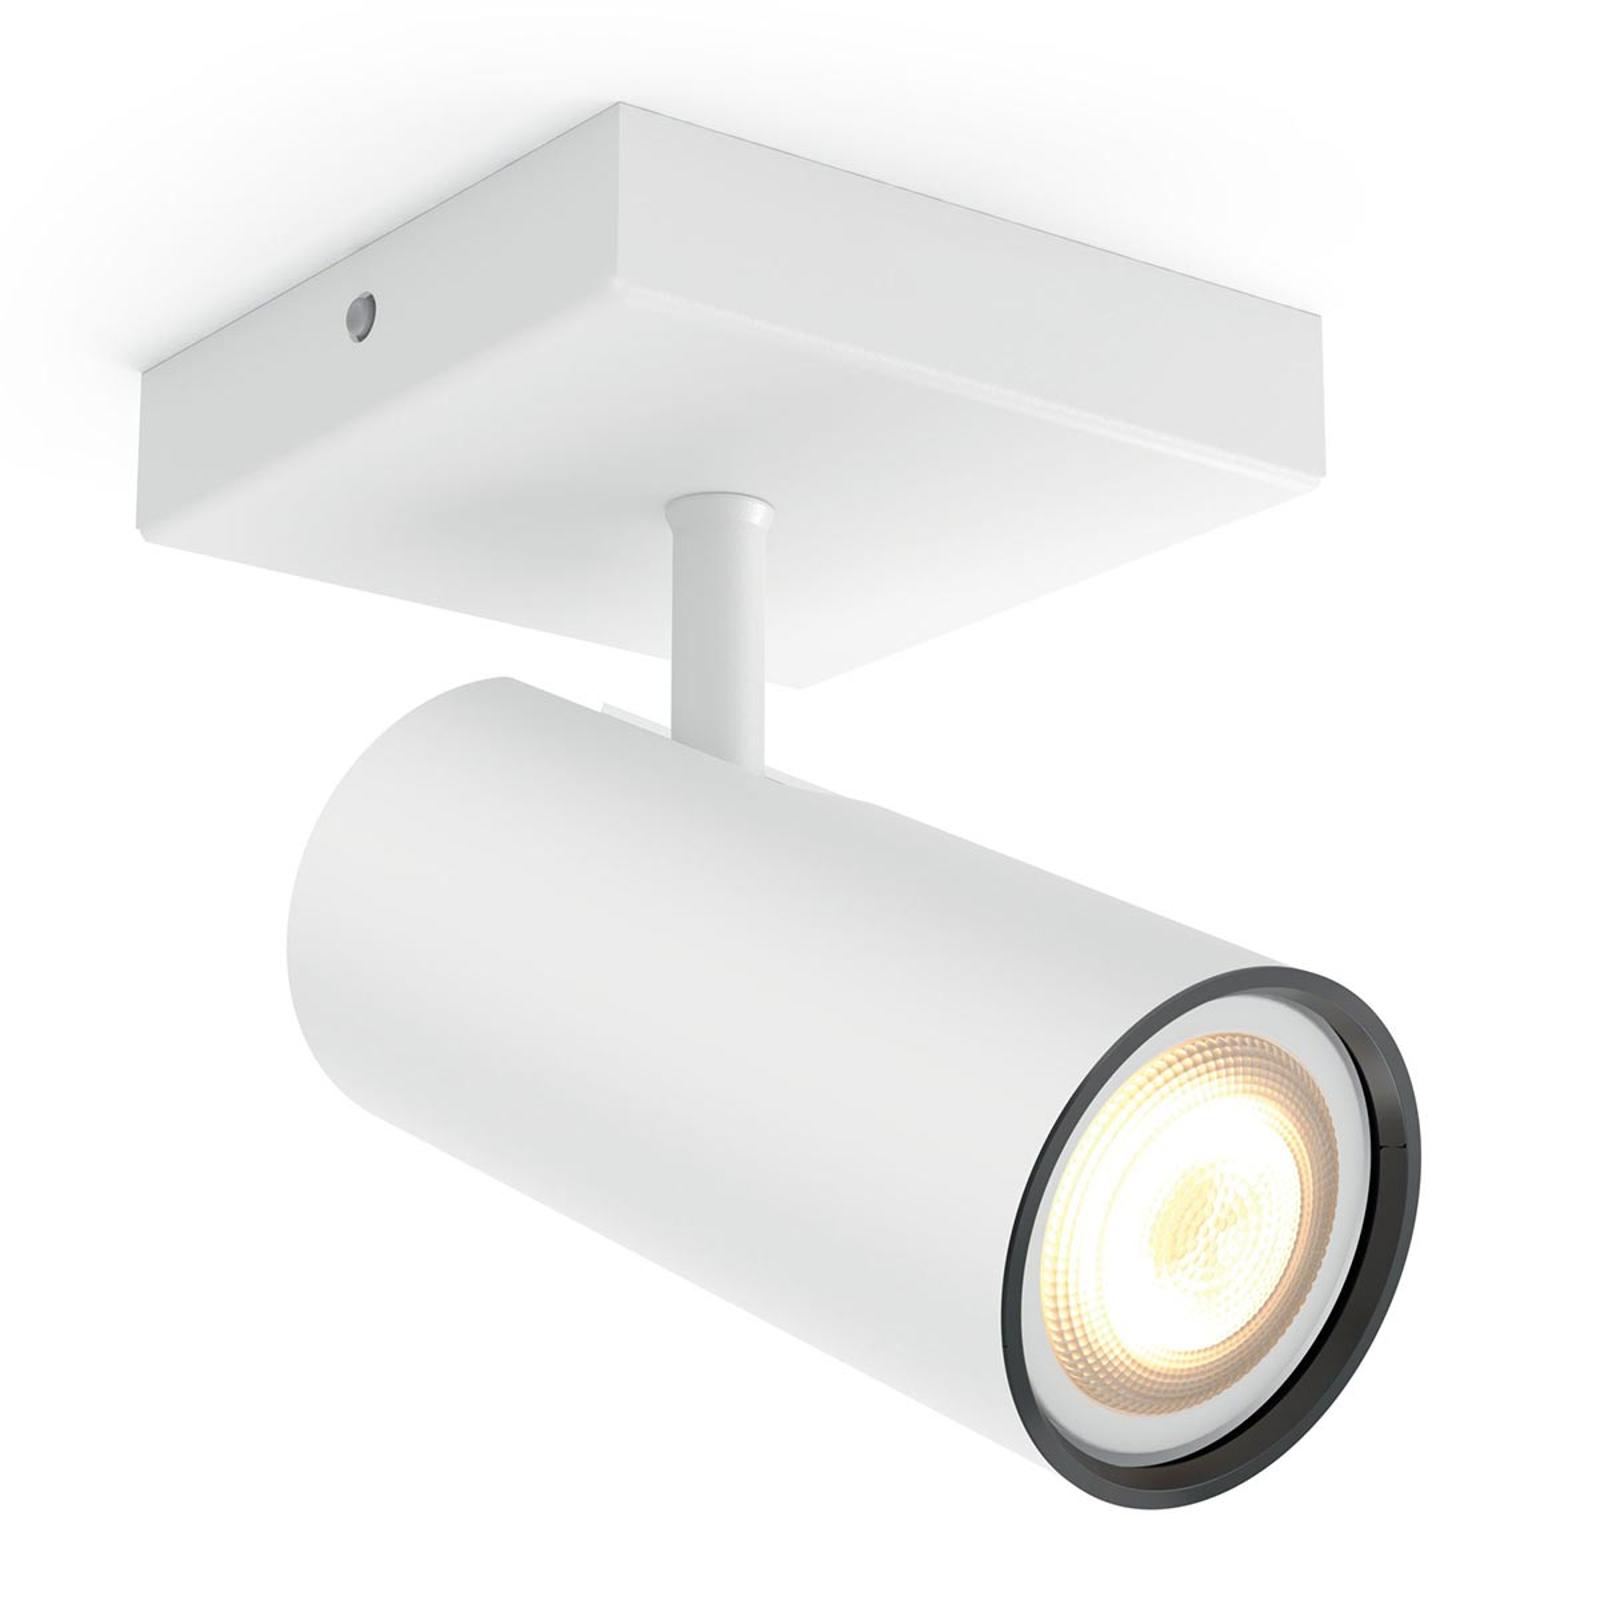 Philips Hue Buratto LED spot vit 1 lampa dimmer   Lamp24.se